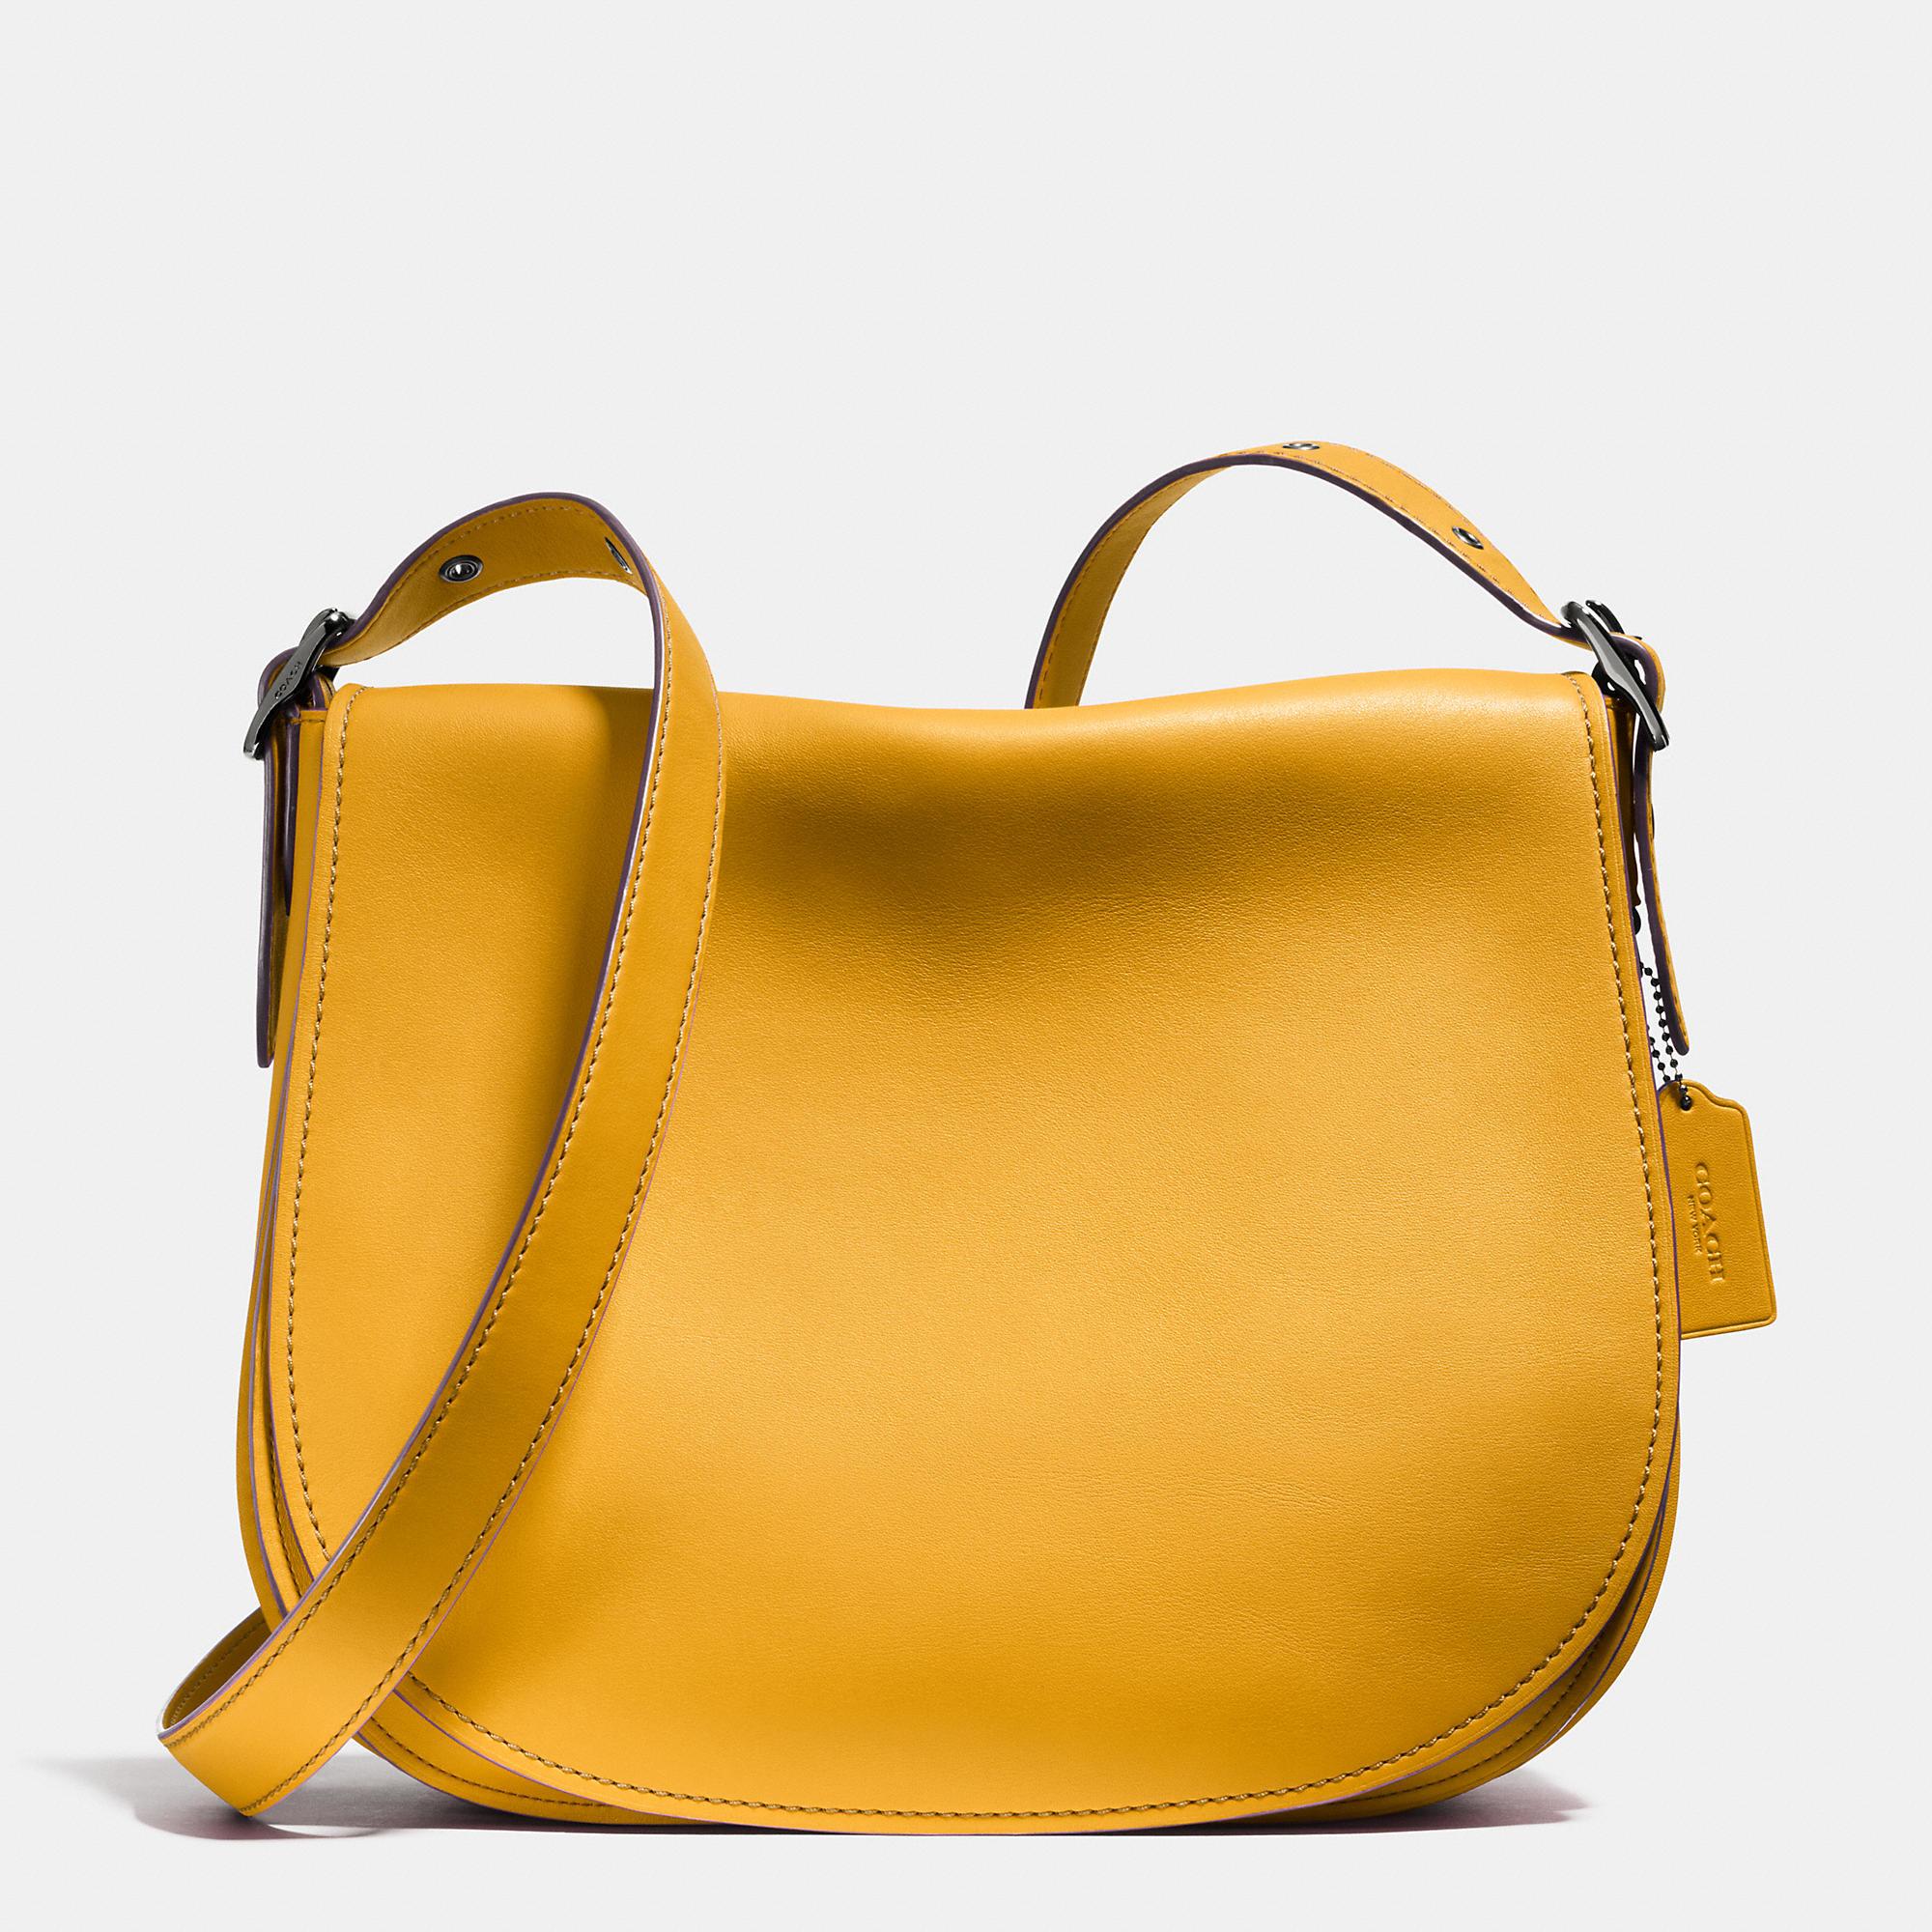 140975b72a66 coach glove tanned saddle bag